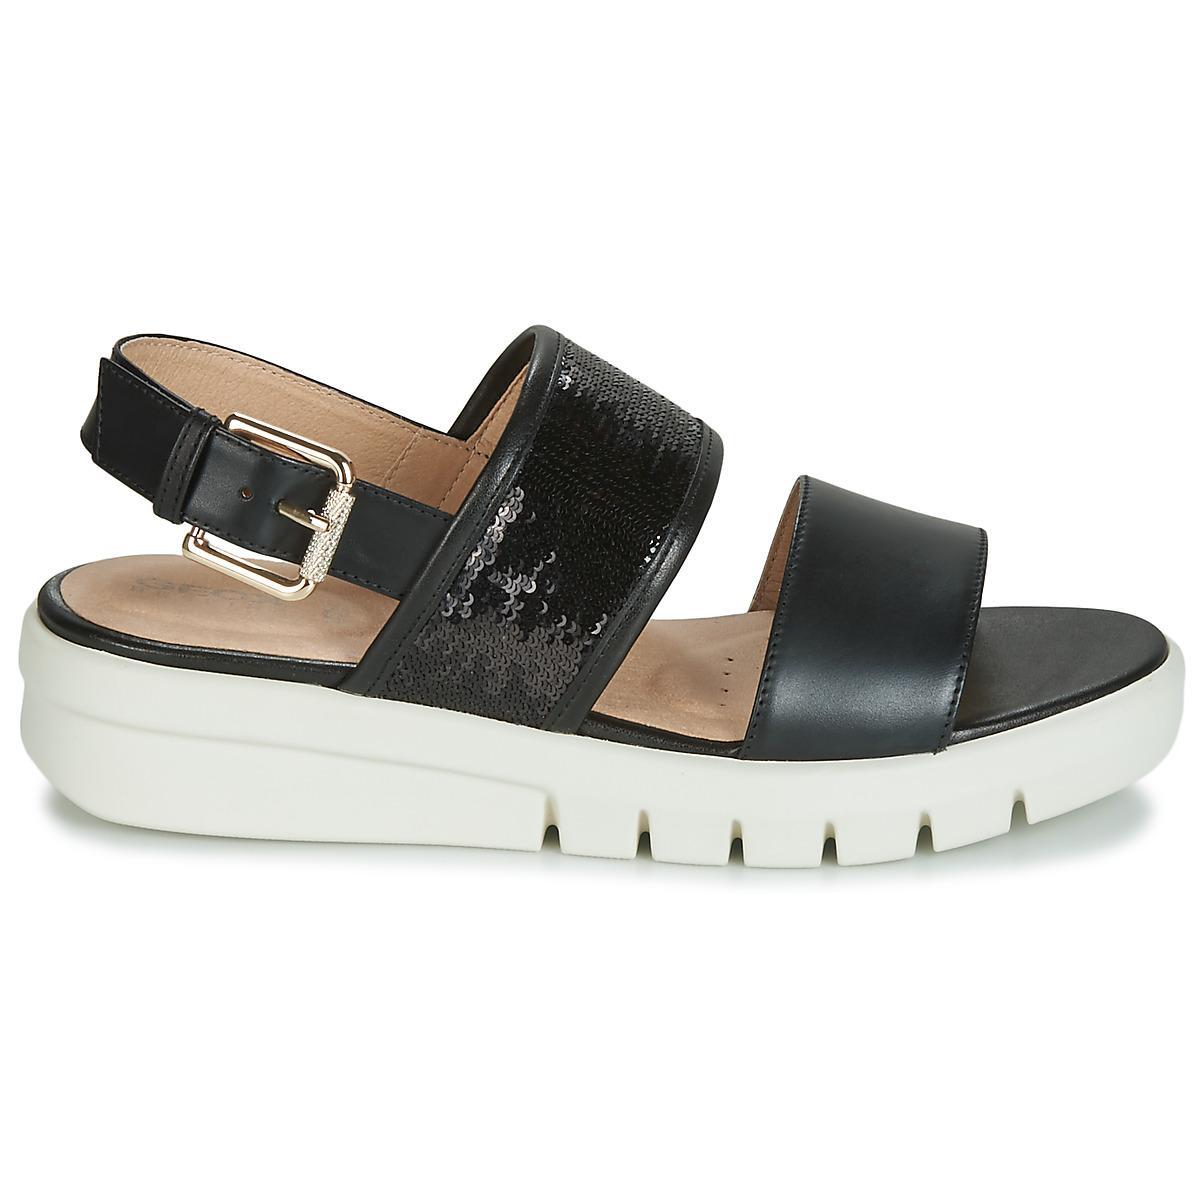 3a06532ea4e Geox - Black D Wimbley Sandal Sandals - Lyst. View fullscreen